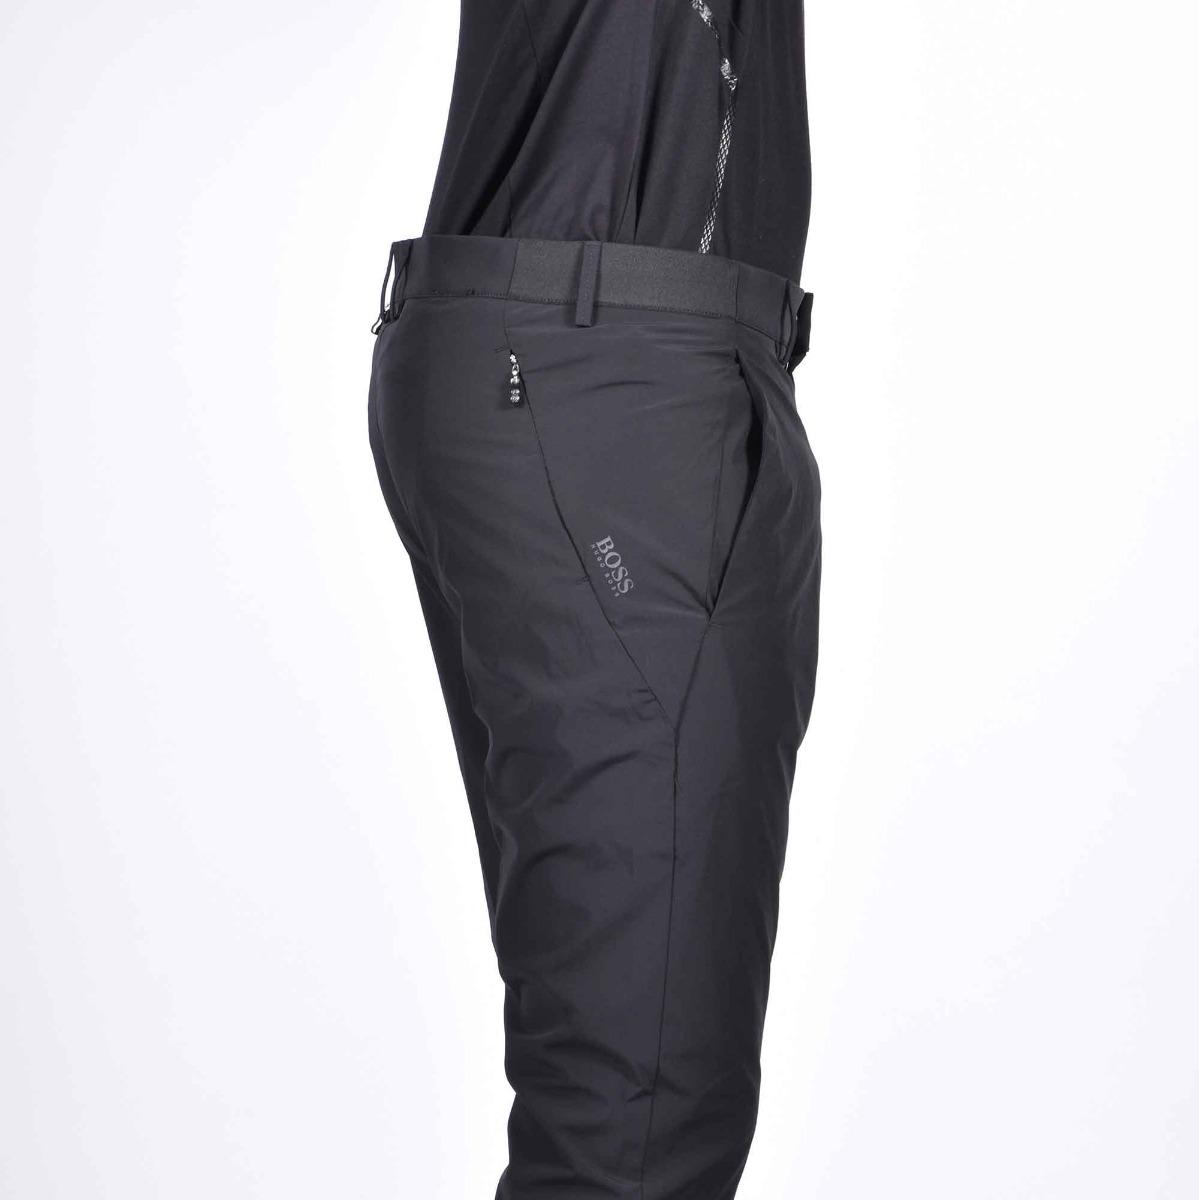 Pantalone tessuto tecnico - Nero